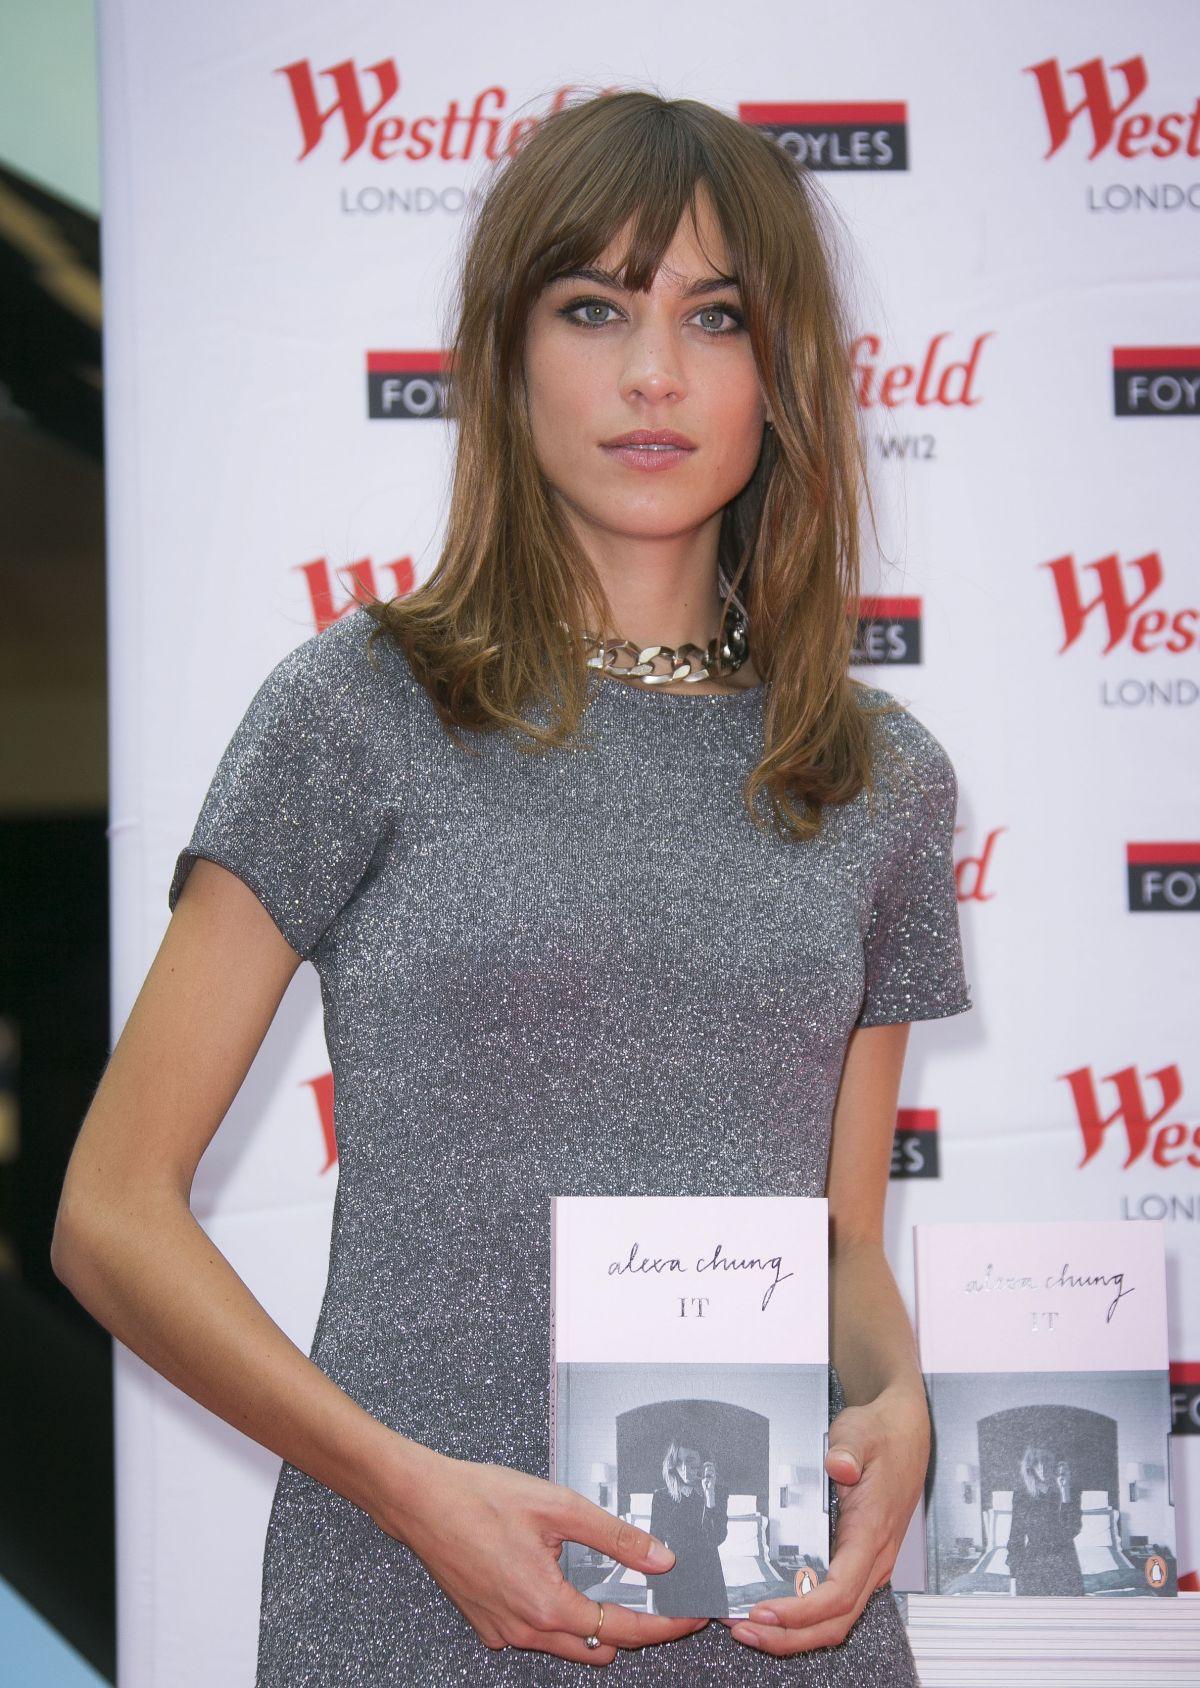 ALEXA CHUBNG at If Book Signing at Westfield in London